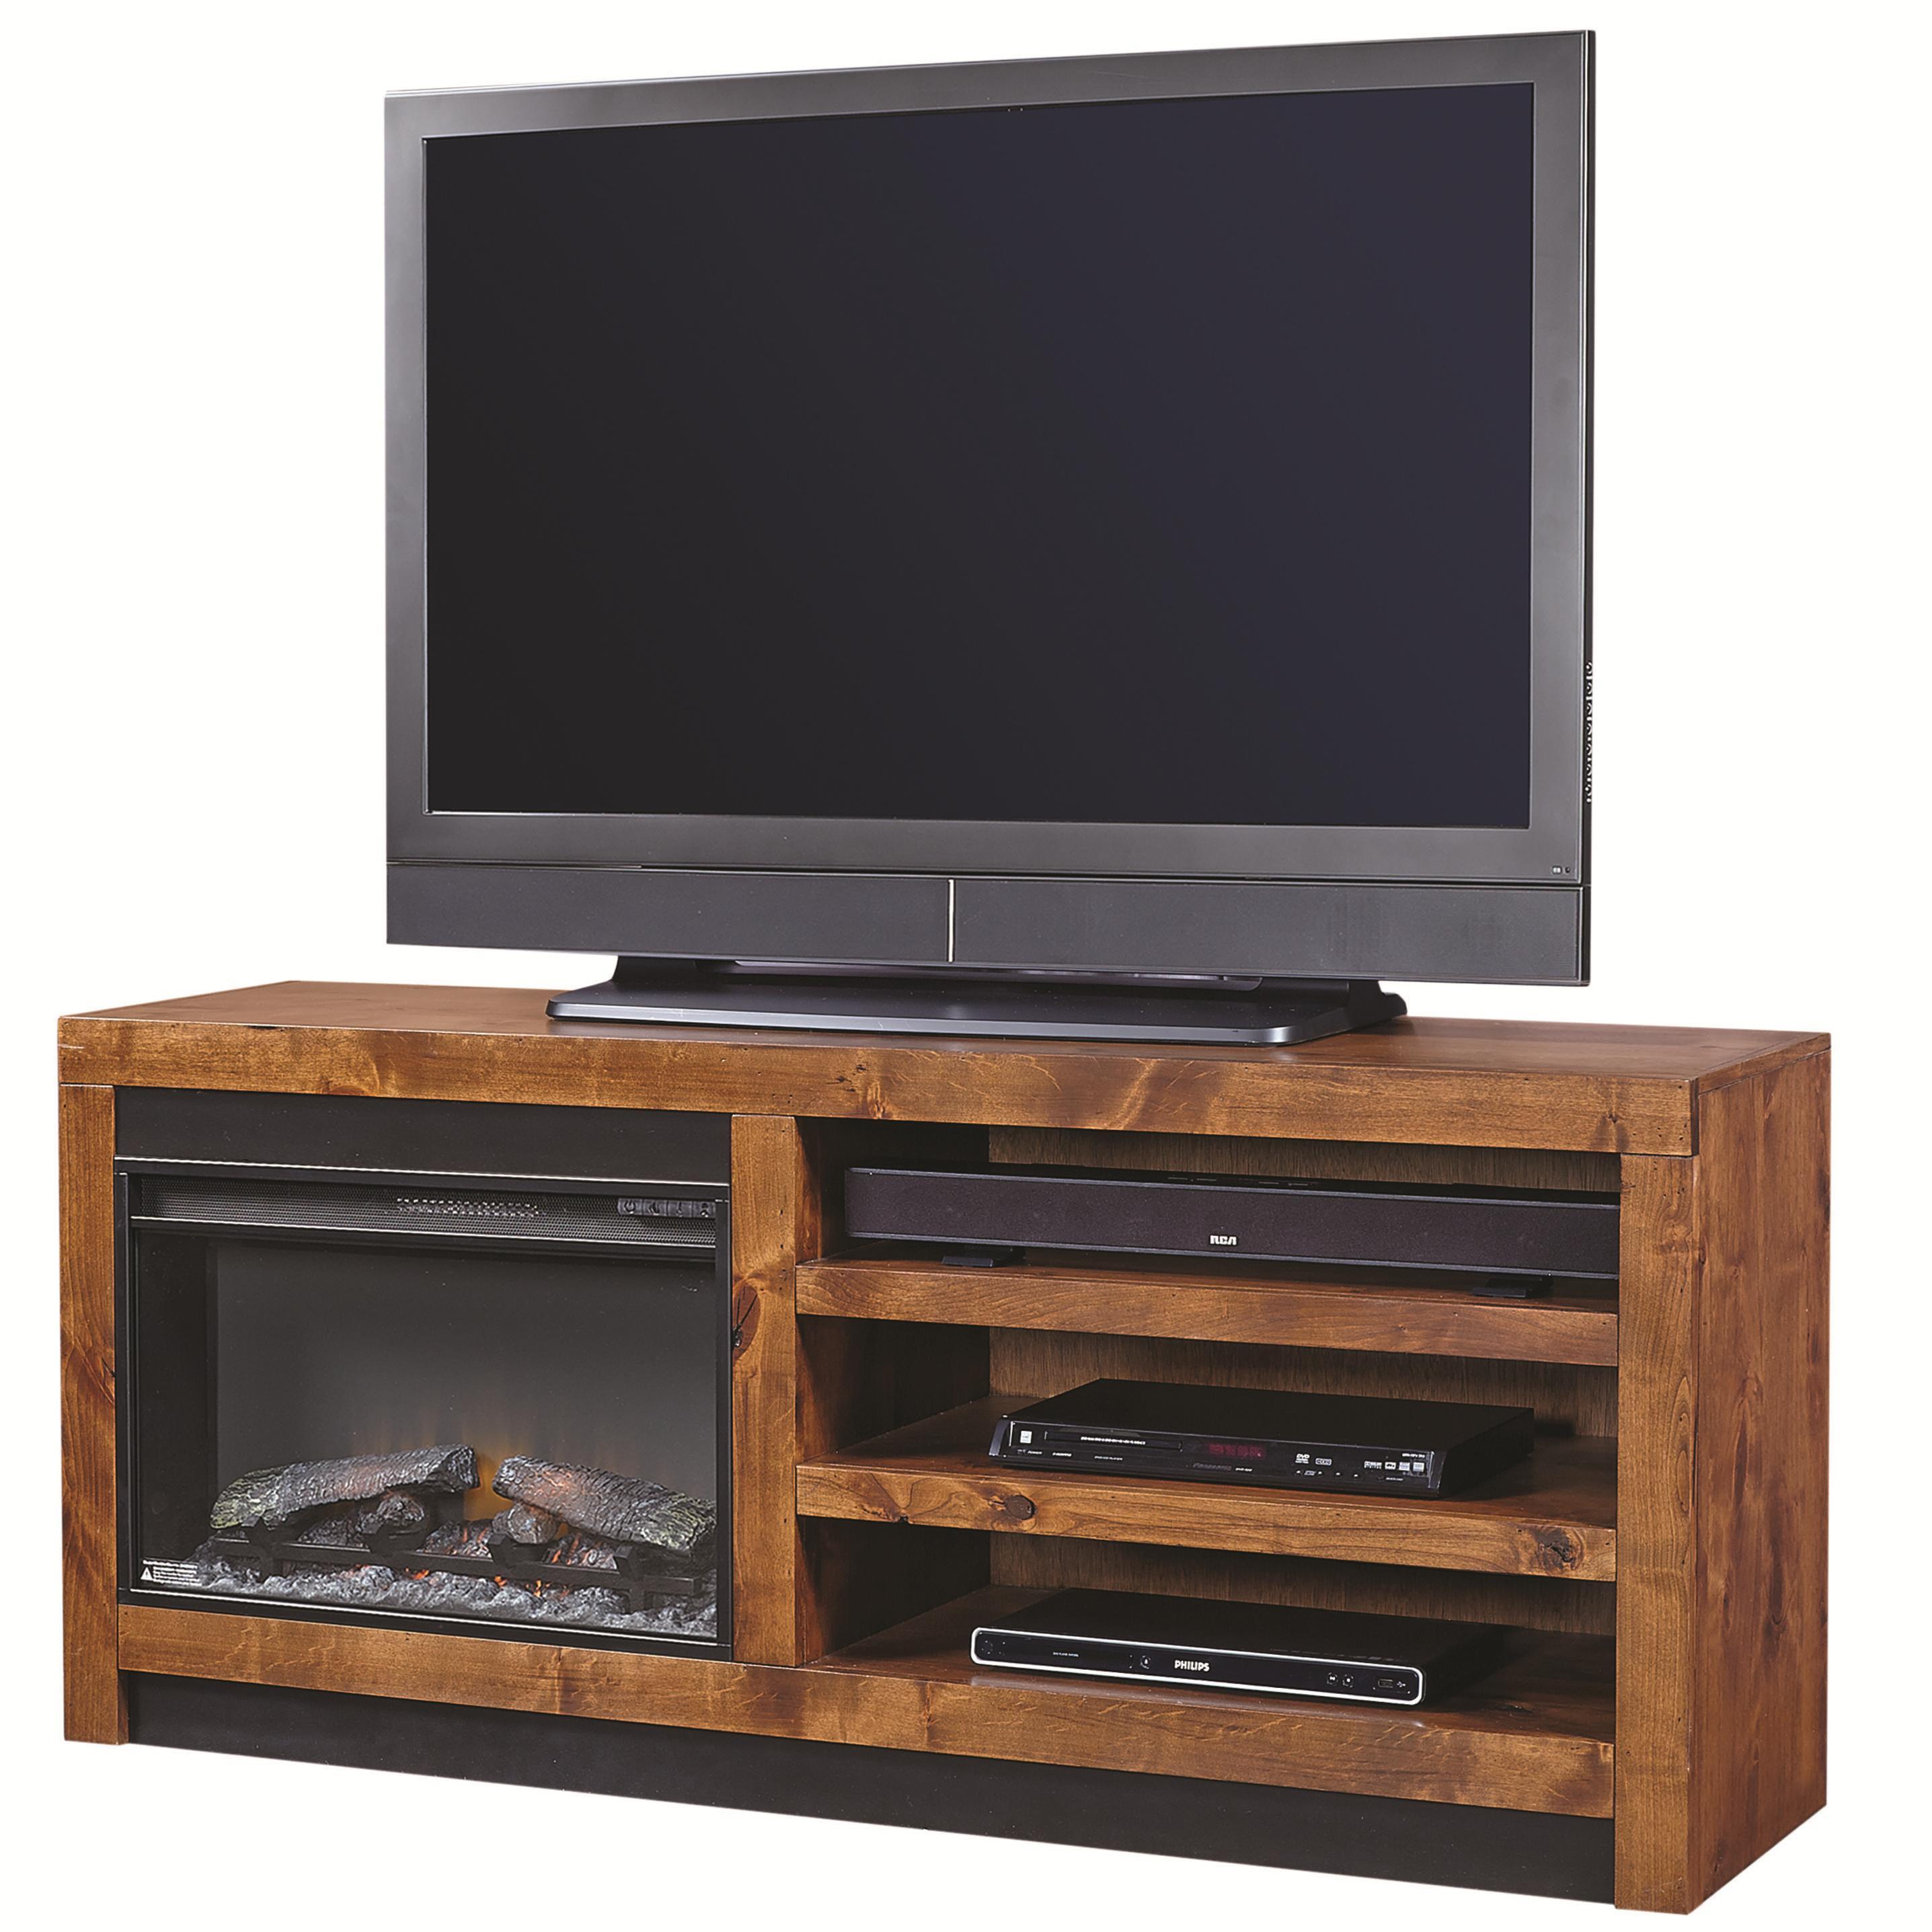 aspenhome contemporary alder 65 inch fireplace console with 2 shelves belfort furniture tv. Black Bedroom Furniture Sets. Home Design Ideas